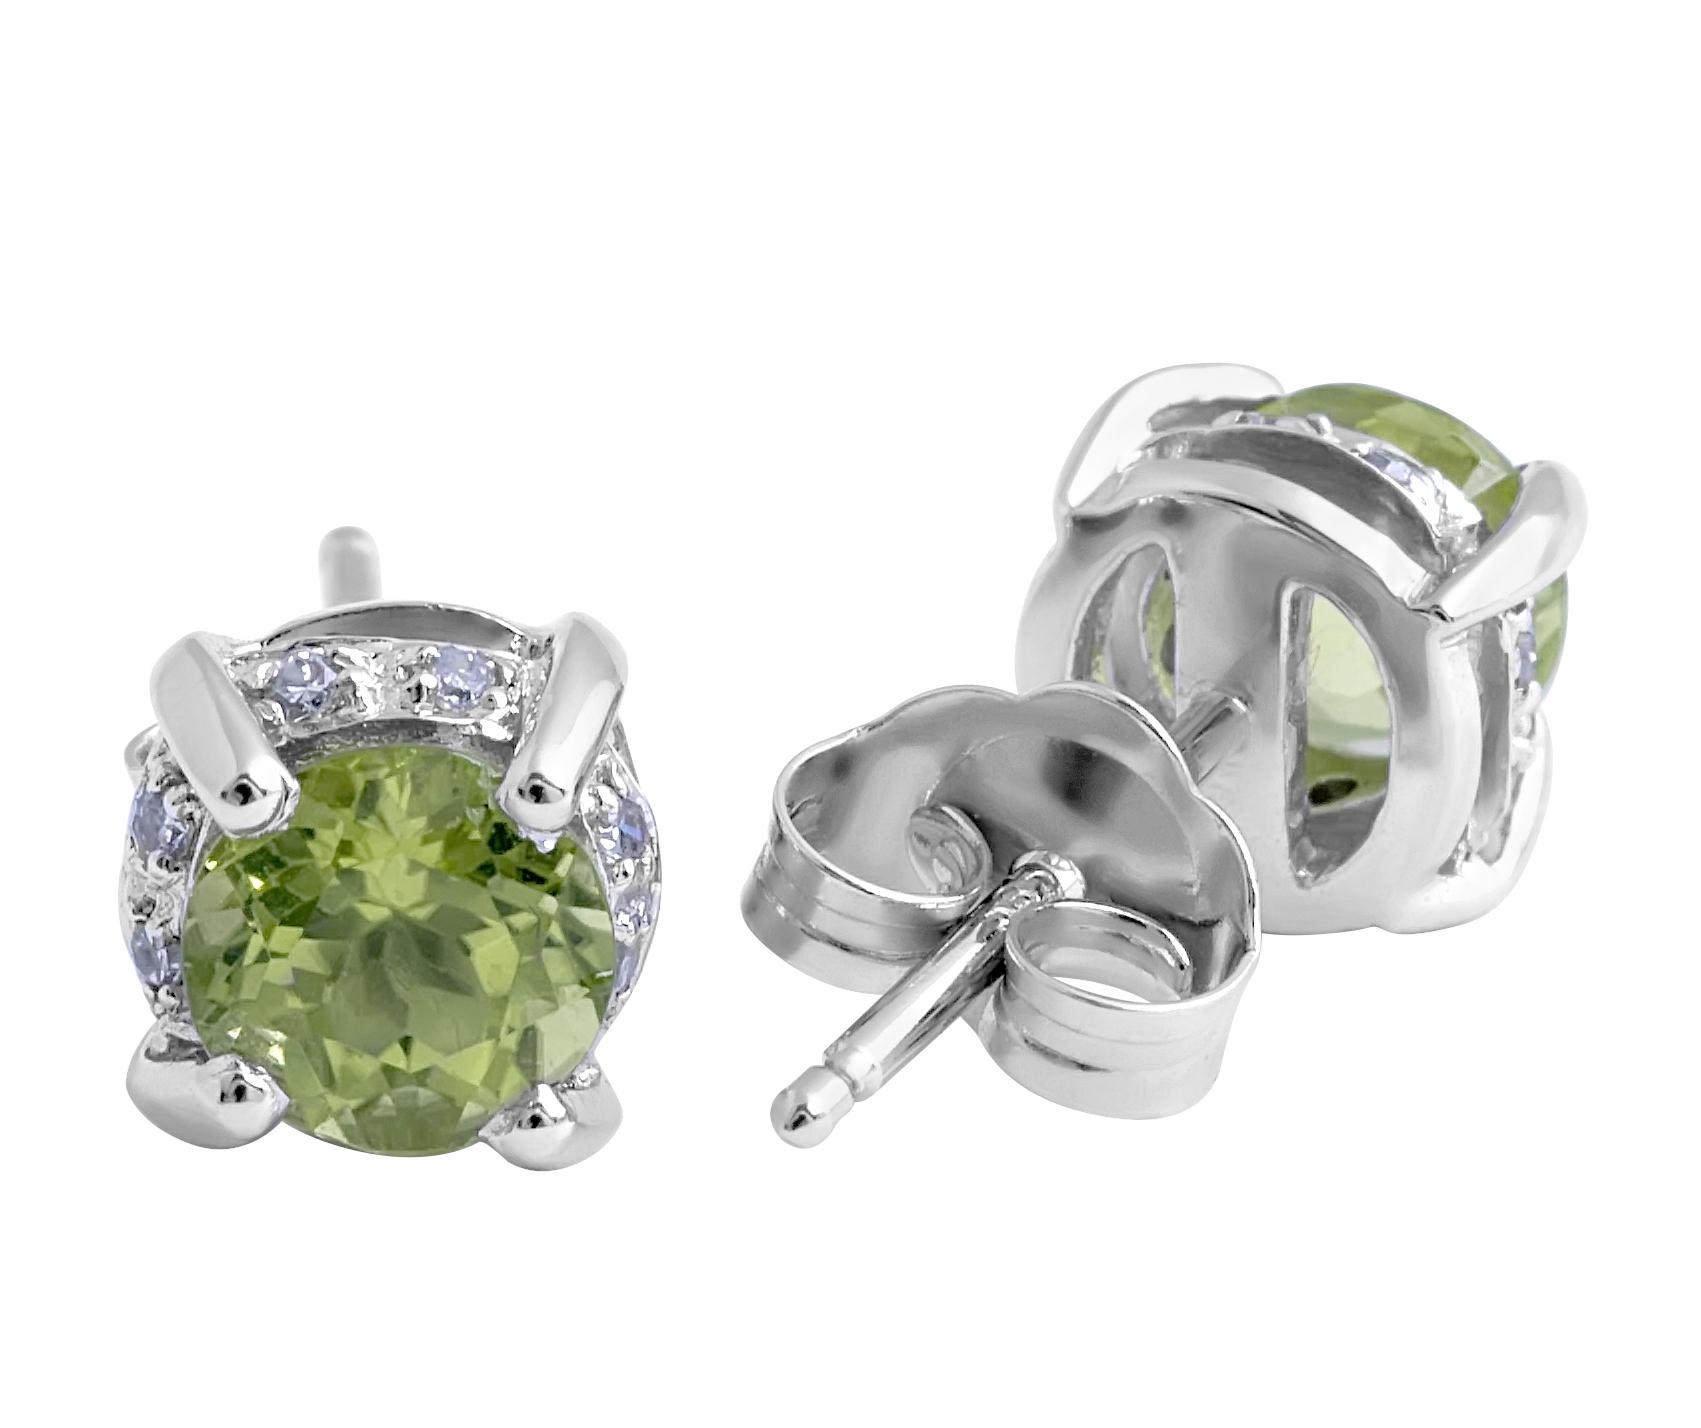 Peridot and Micro-pave Diamond Stud Earrings